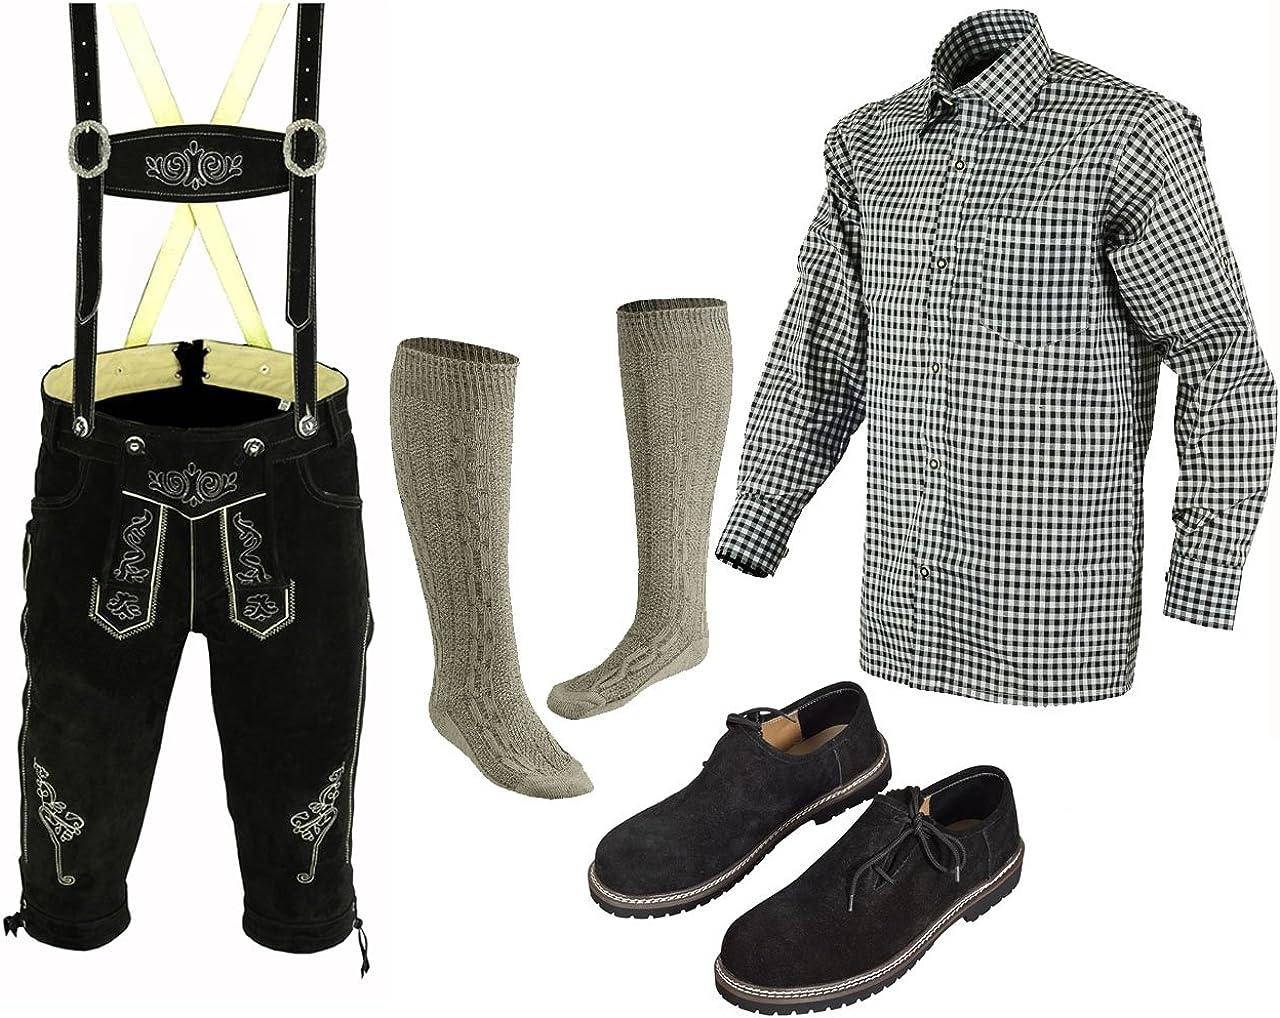 Speed4allkinds Herren Trachten Lederhose 46 62 Trachten Set 5 Teilig Bayerische Trachtenlederhose,Hemd,Schuhe,Socken Neu